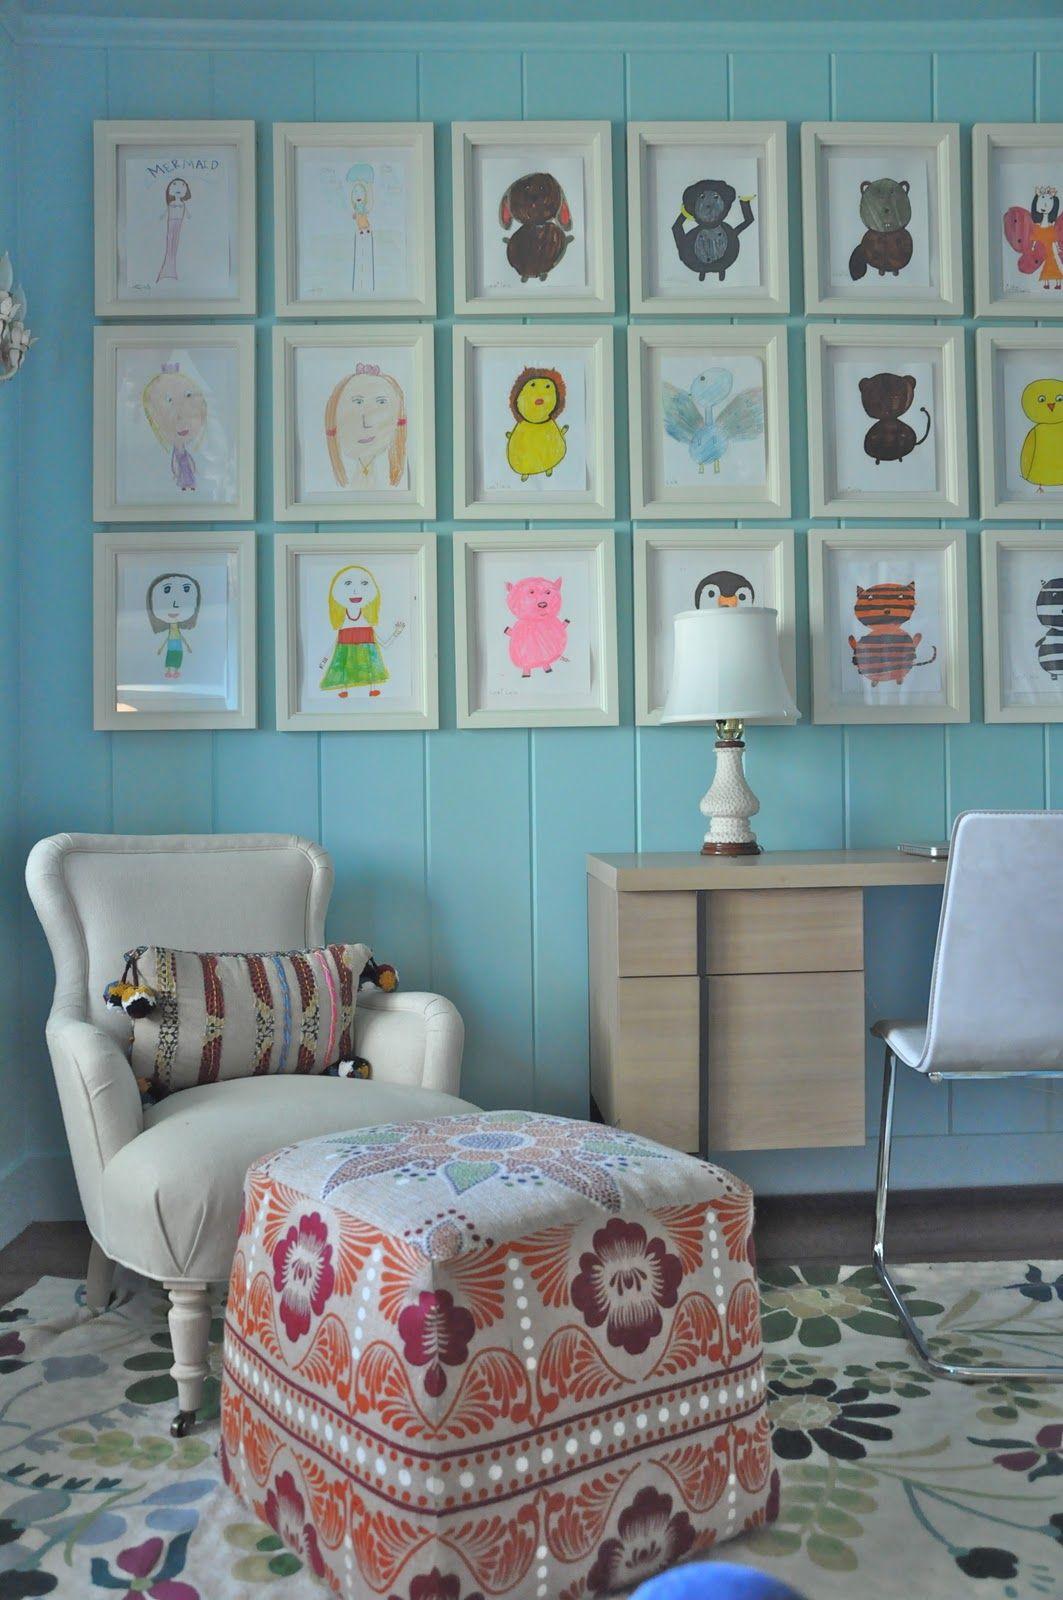 Best crafts for 8 yr old girl -  Best Crafts For 8 Yr Old Girl Crafts For Download